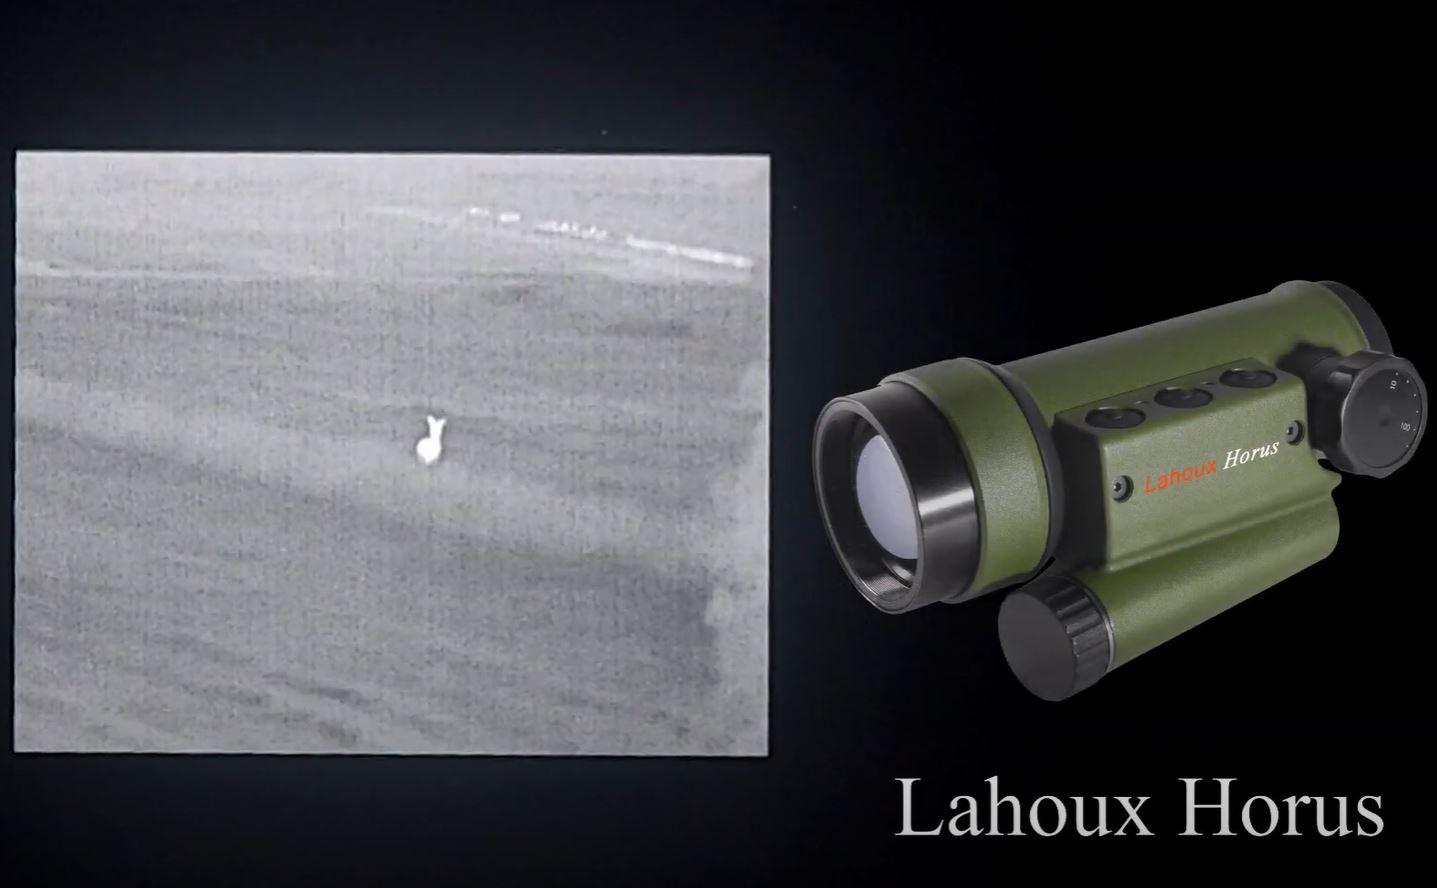 Lahoux Horus - Aufnahmen